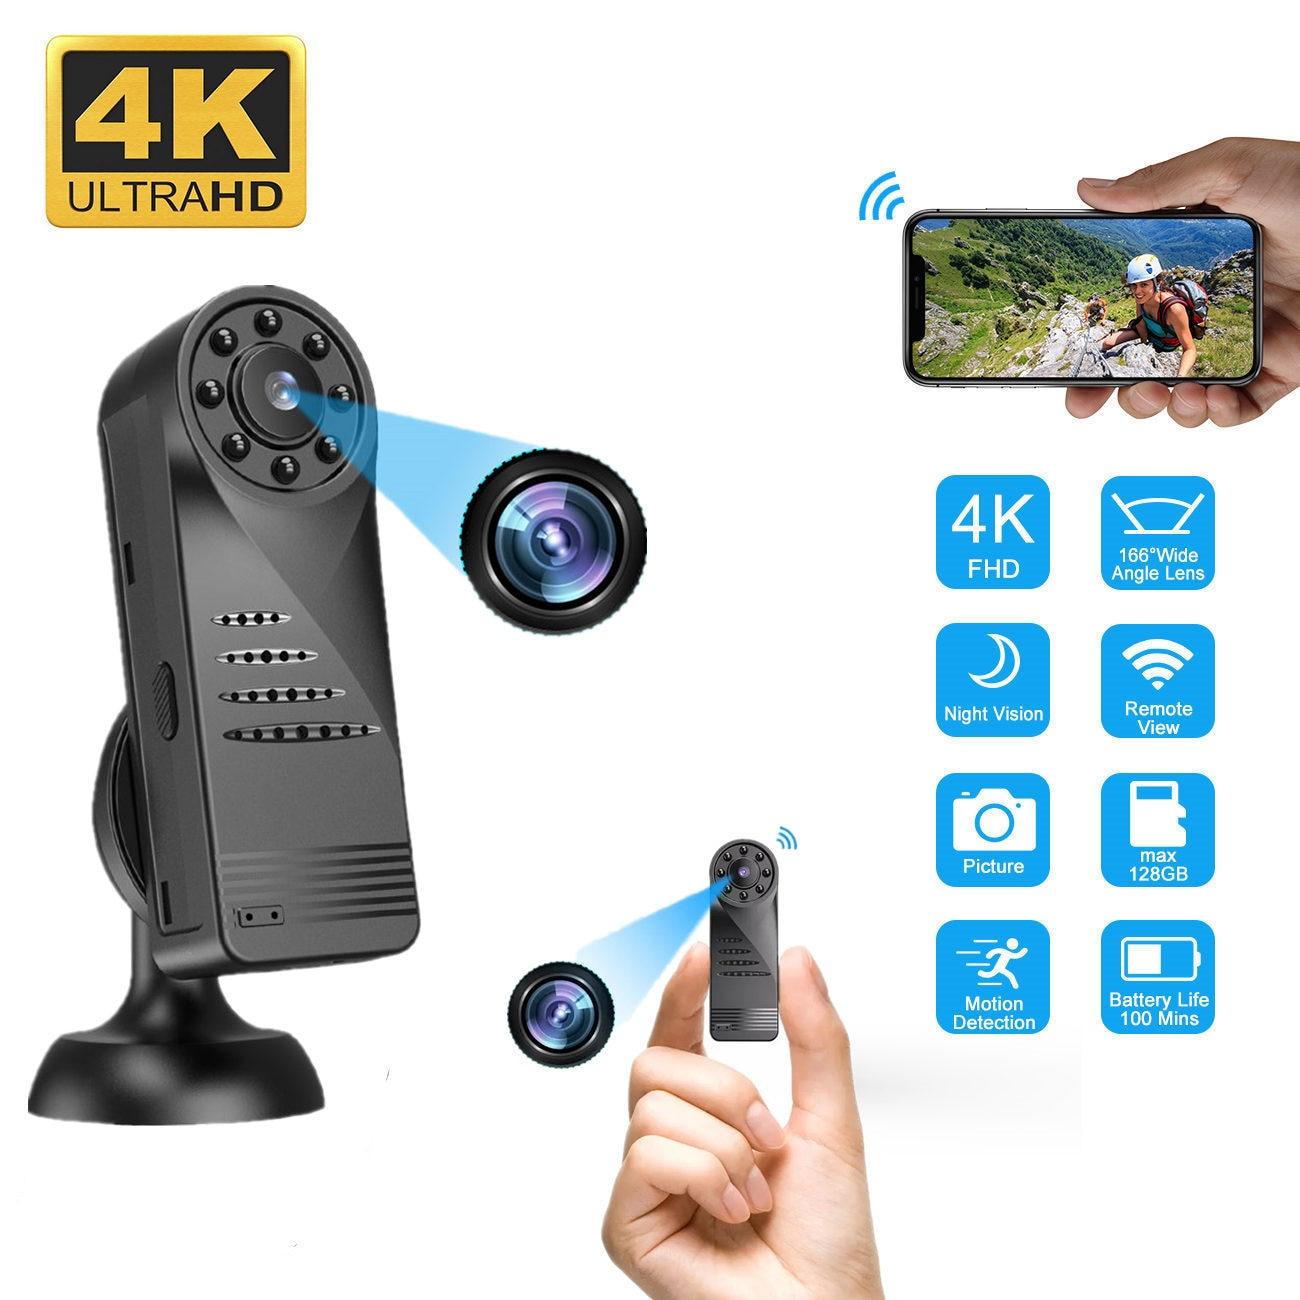 Mini cámara Digital Wifi portátil HD 4K Micro cámara portátil cuerpo cámara...